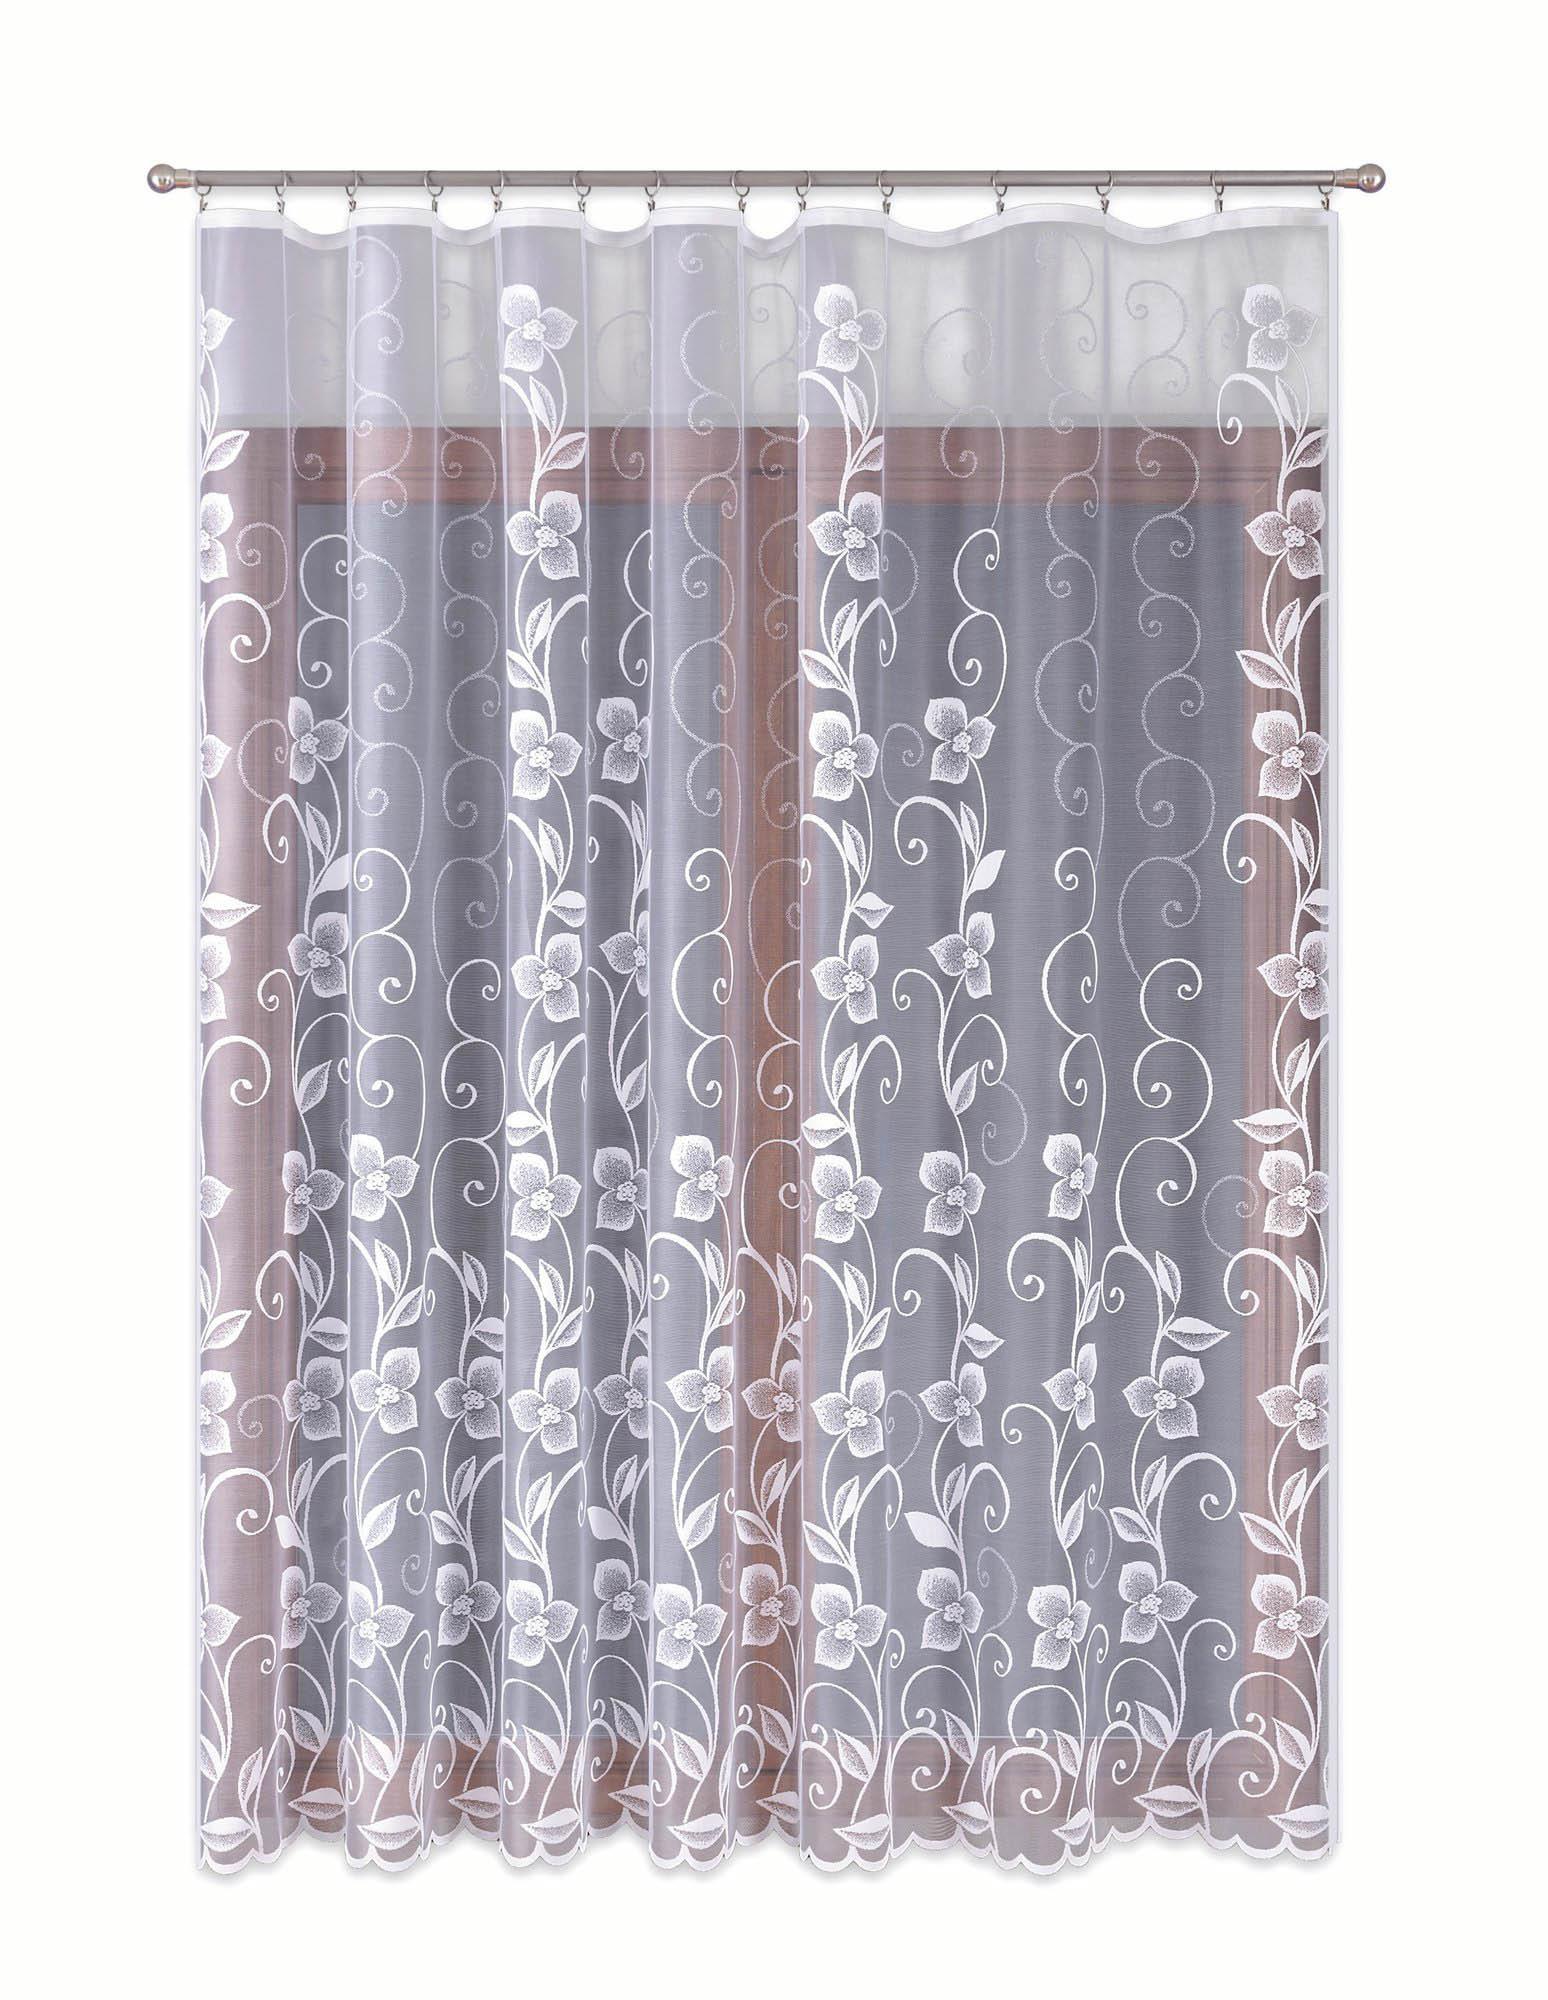 Шторы Primavera Классические шторы Lennon Цвет: Белый шторы primavera классические шторы larry цвет белый